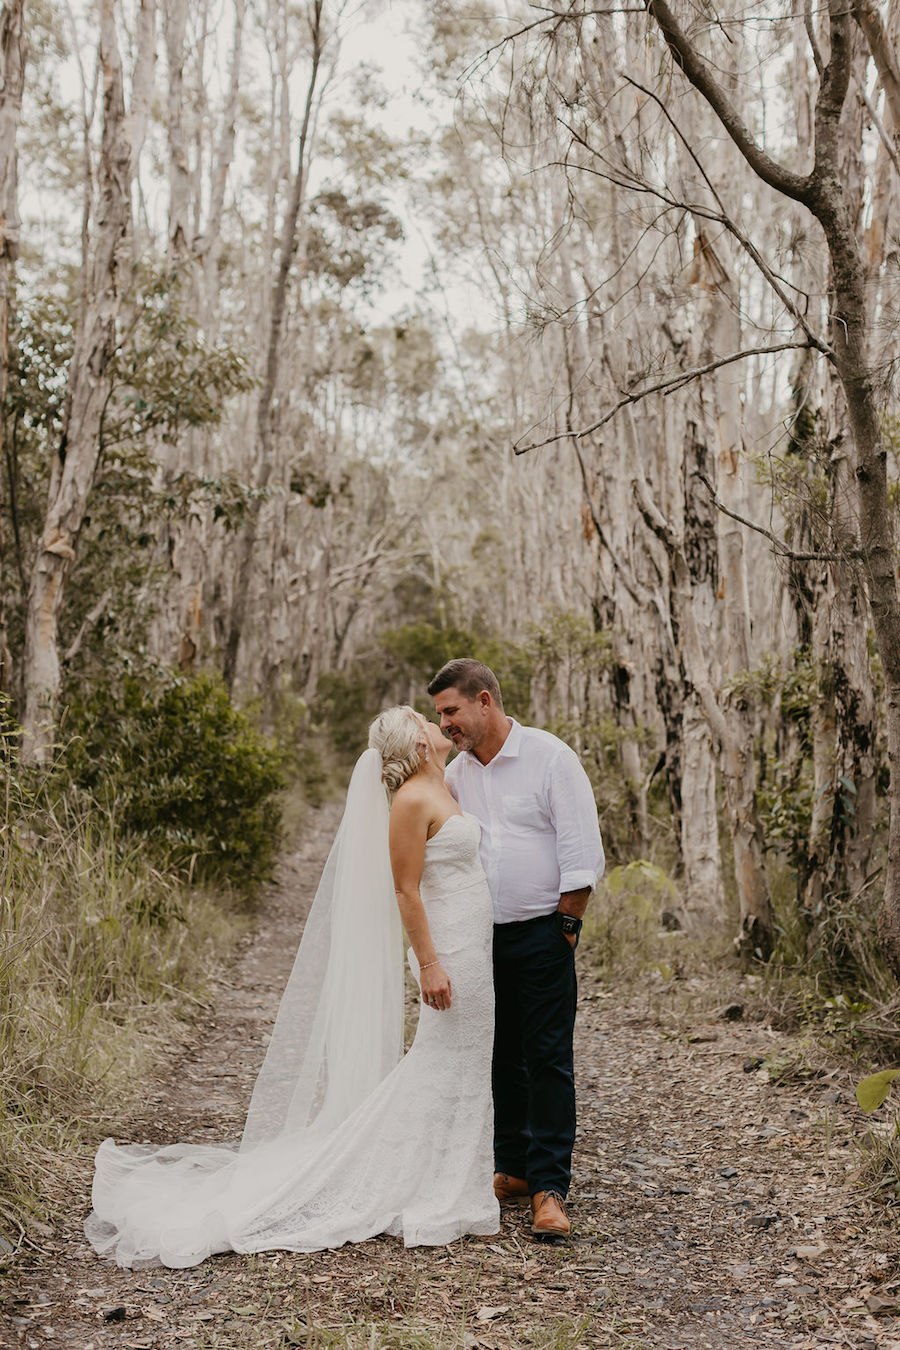 tweed-coast-weddings-wedding-venue-osteria-casuarina-ceremony-reception-5D3A7066.jpg